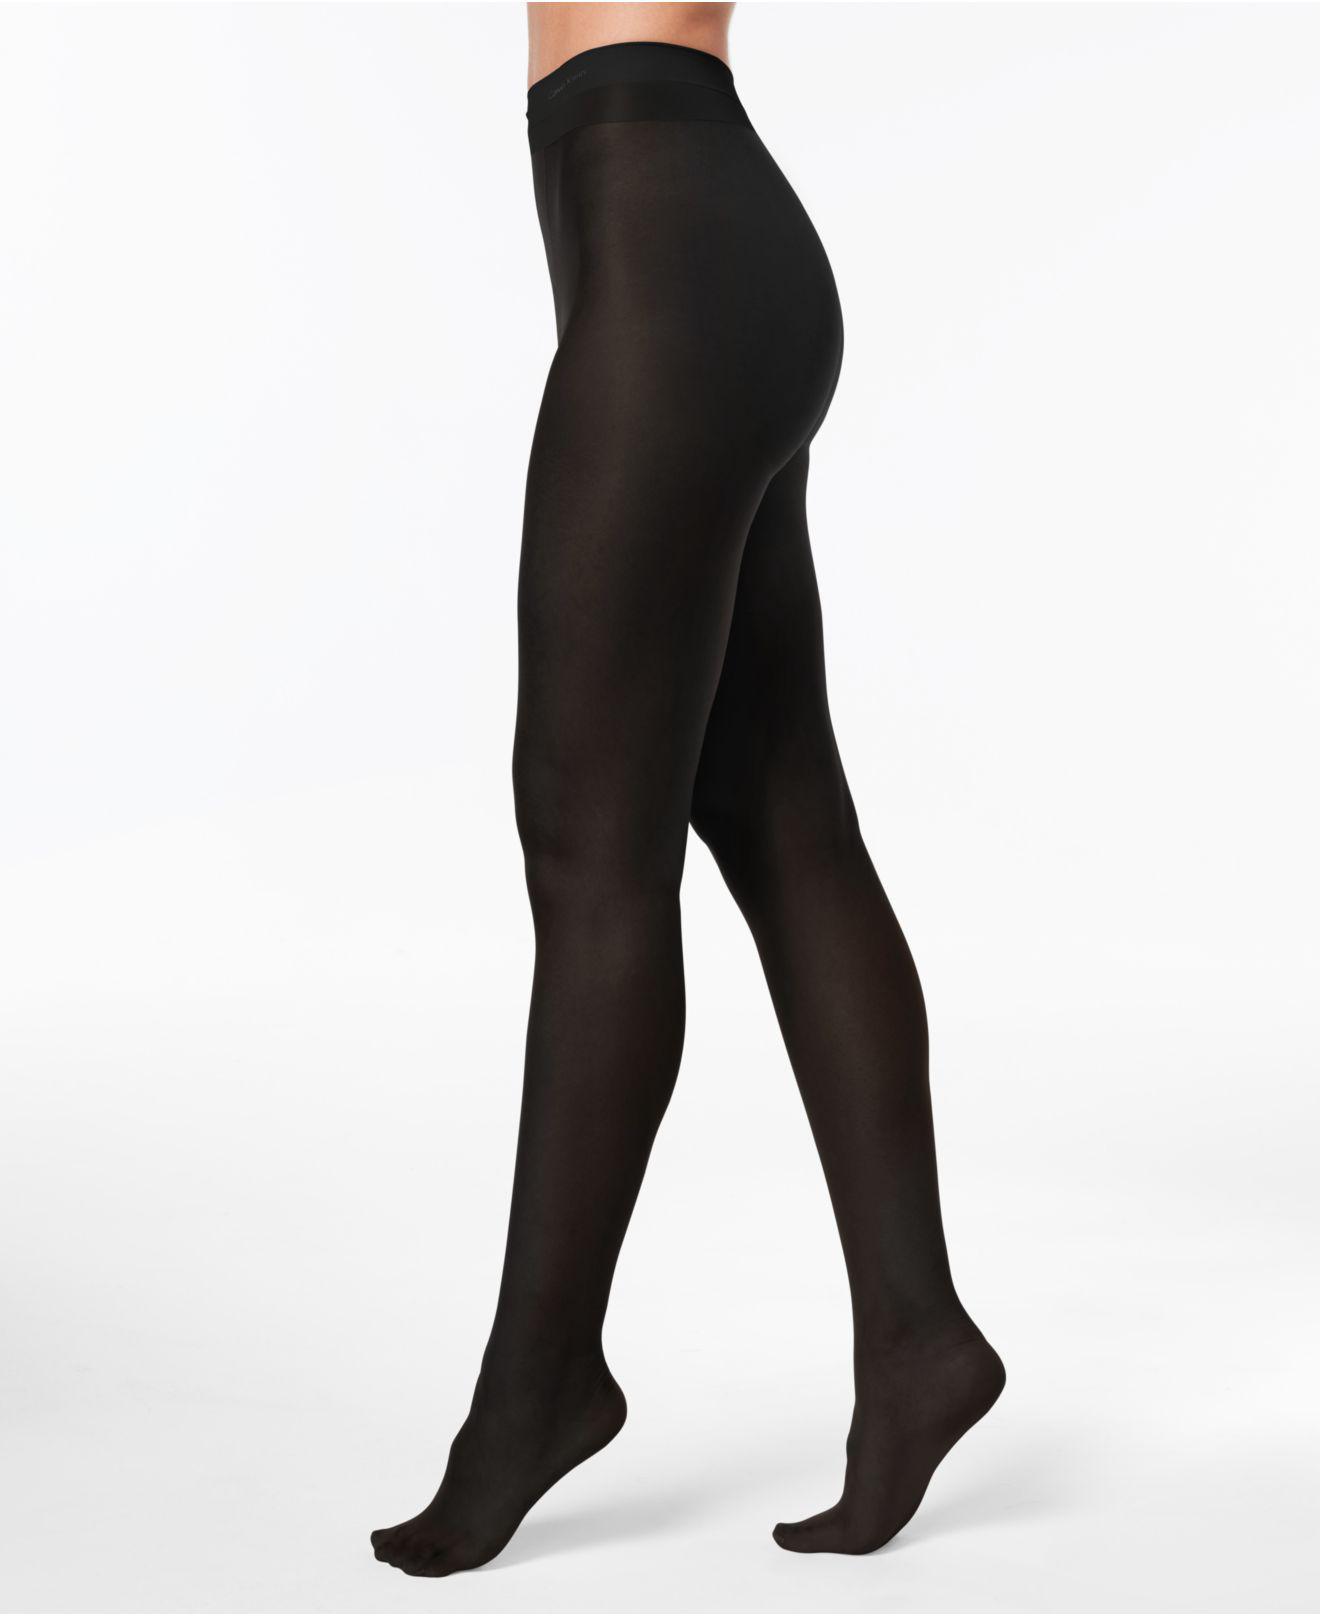 8fdc02d61 Lyst - Calvin Klein Infinite Sheer Control-top Sheers in Black